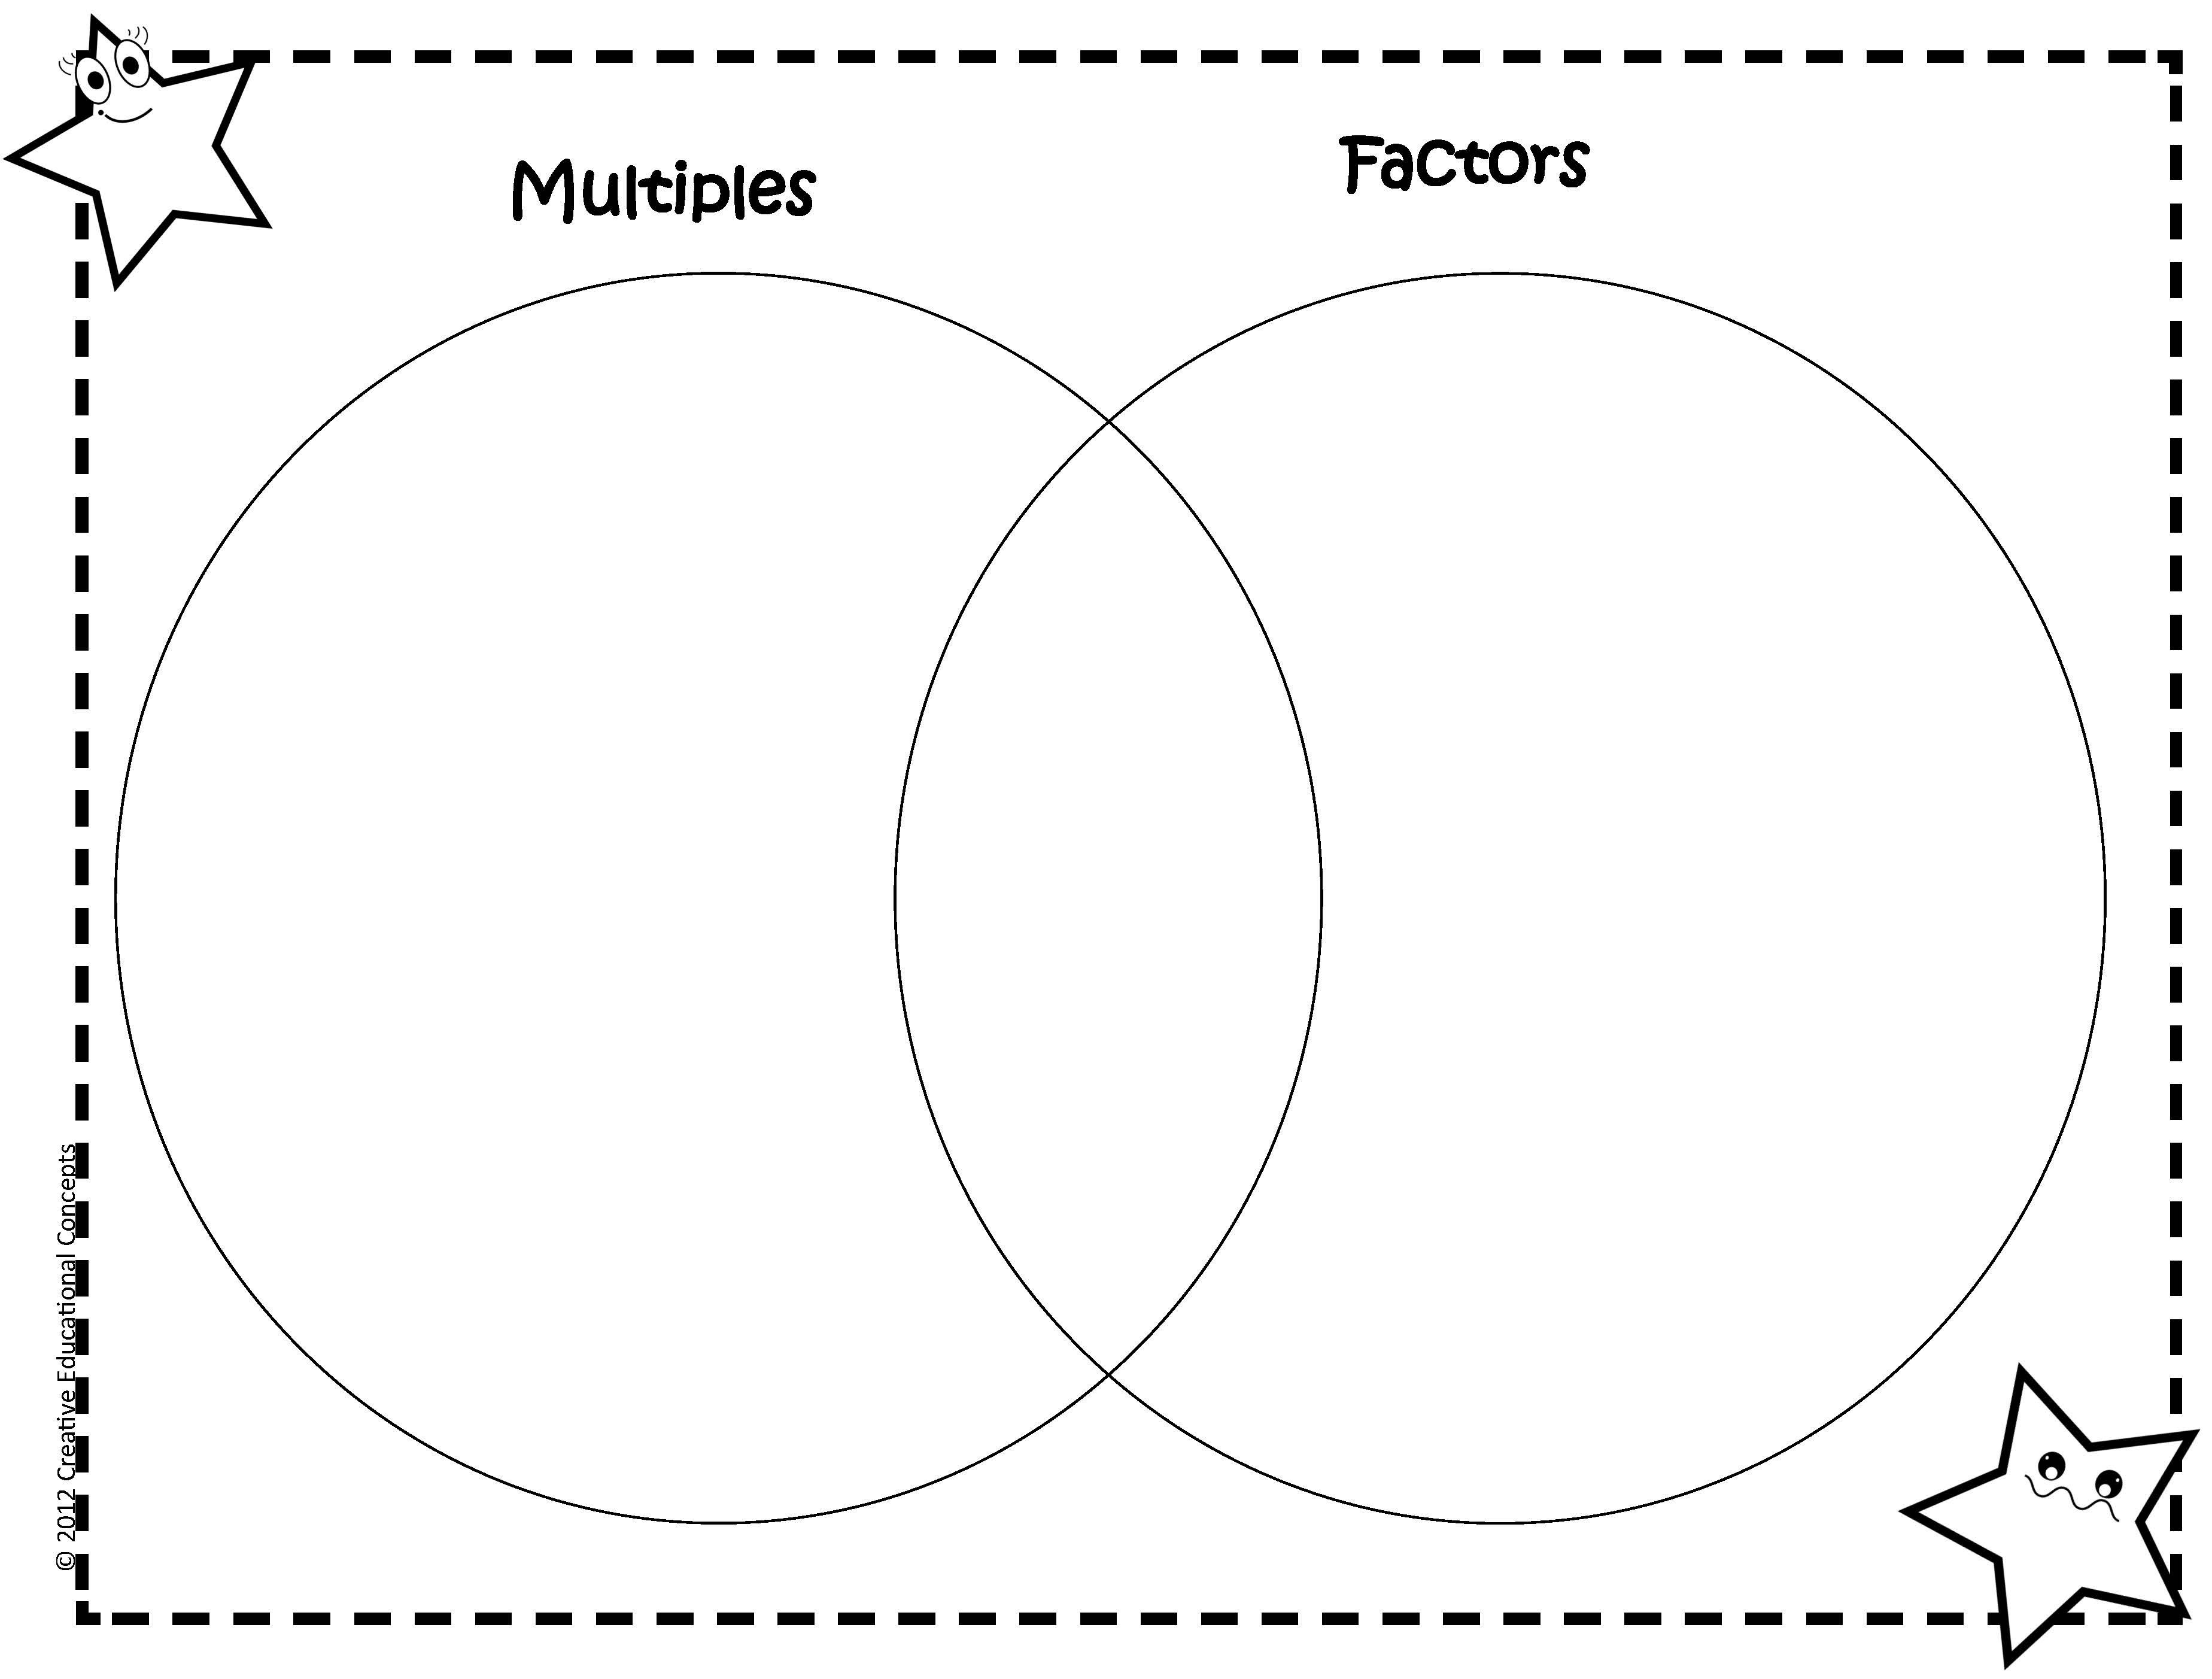 Teaching Tip Factors Vs Multiples